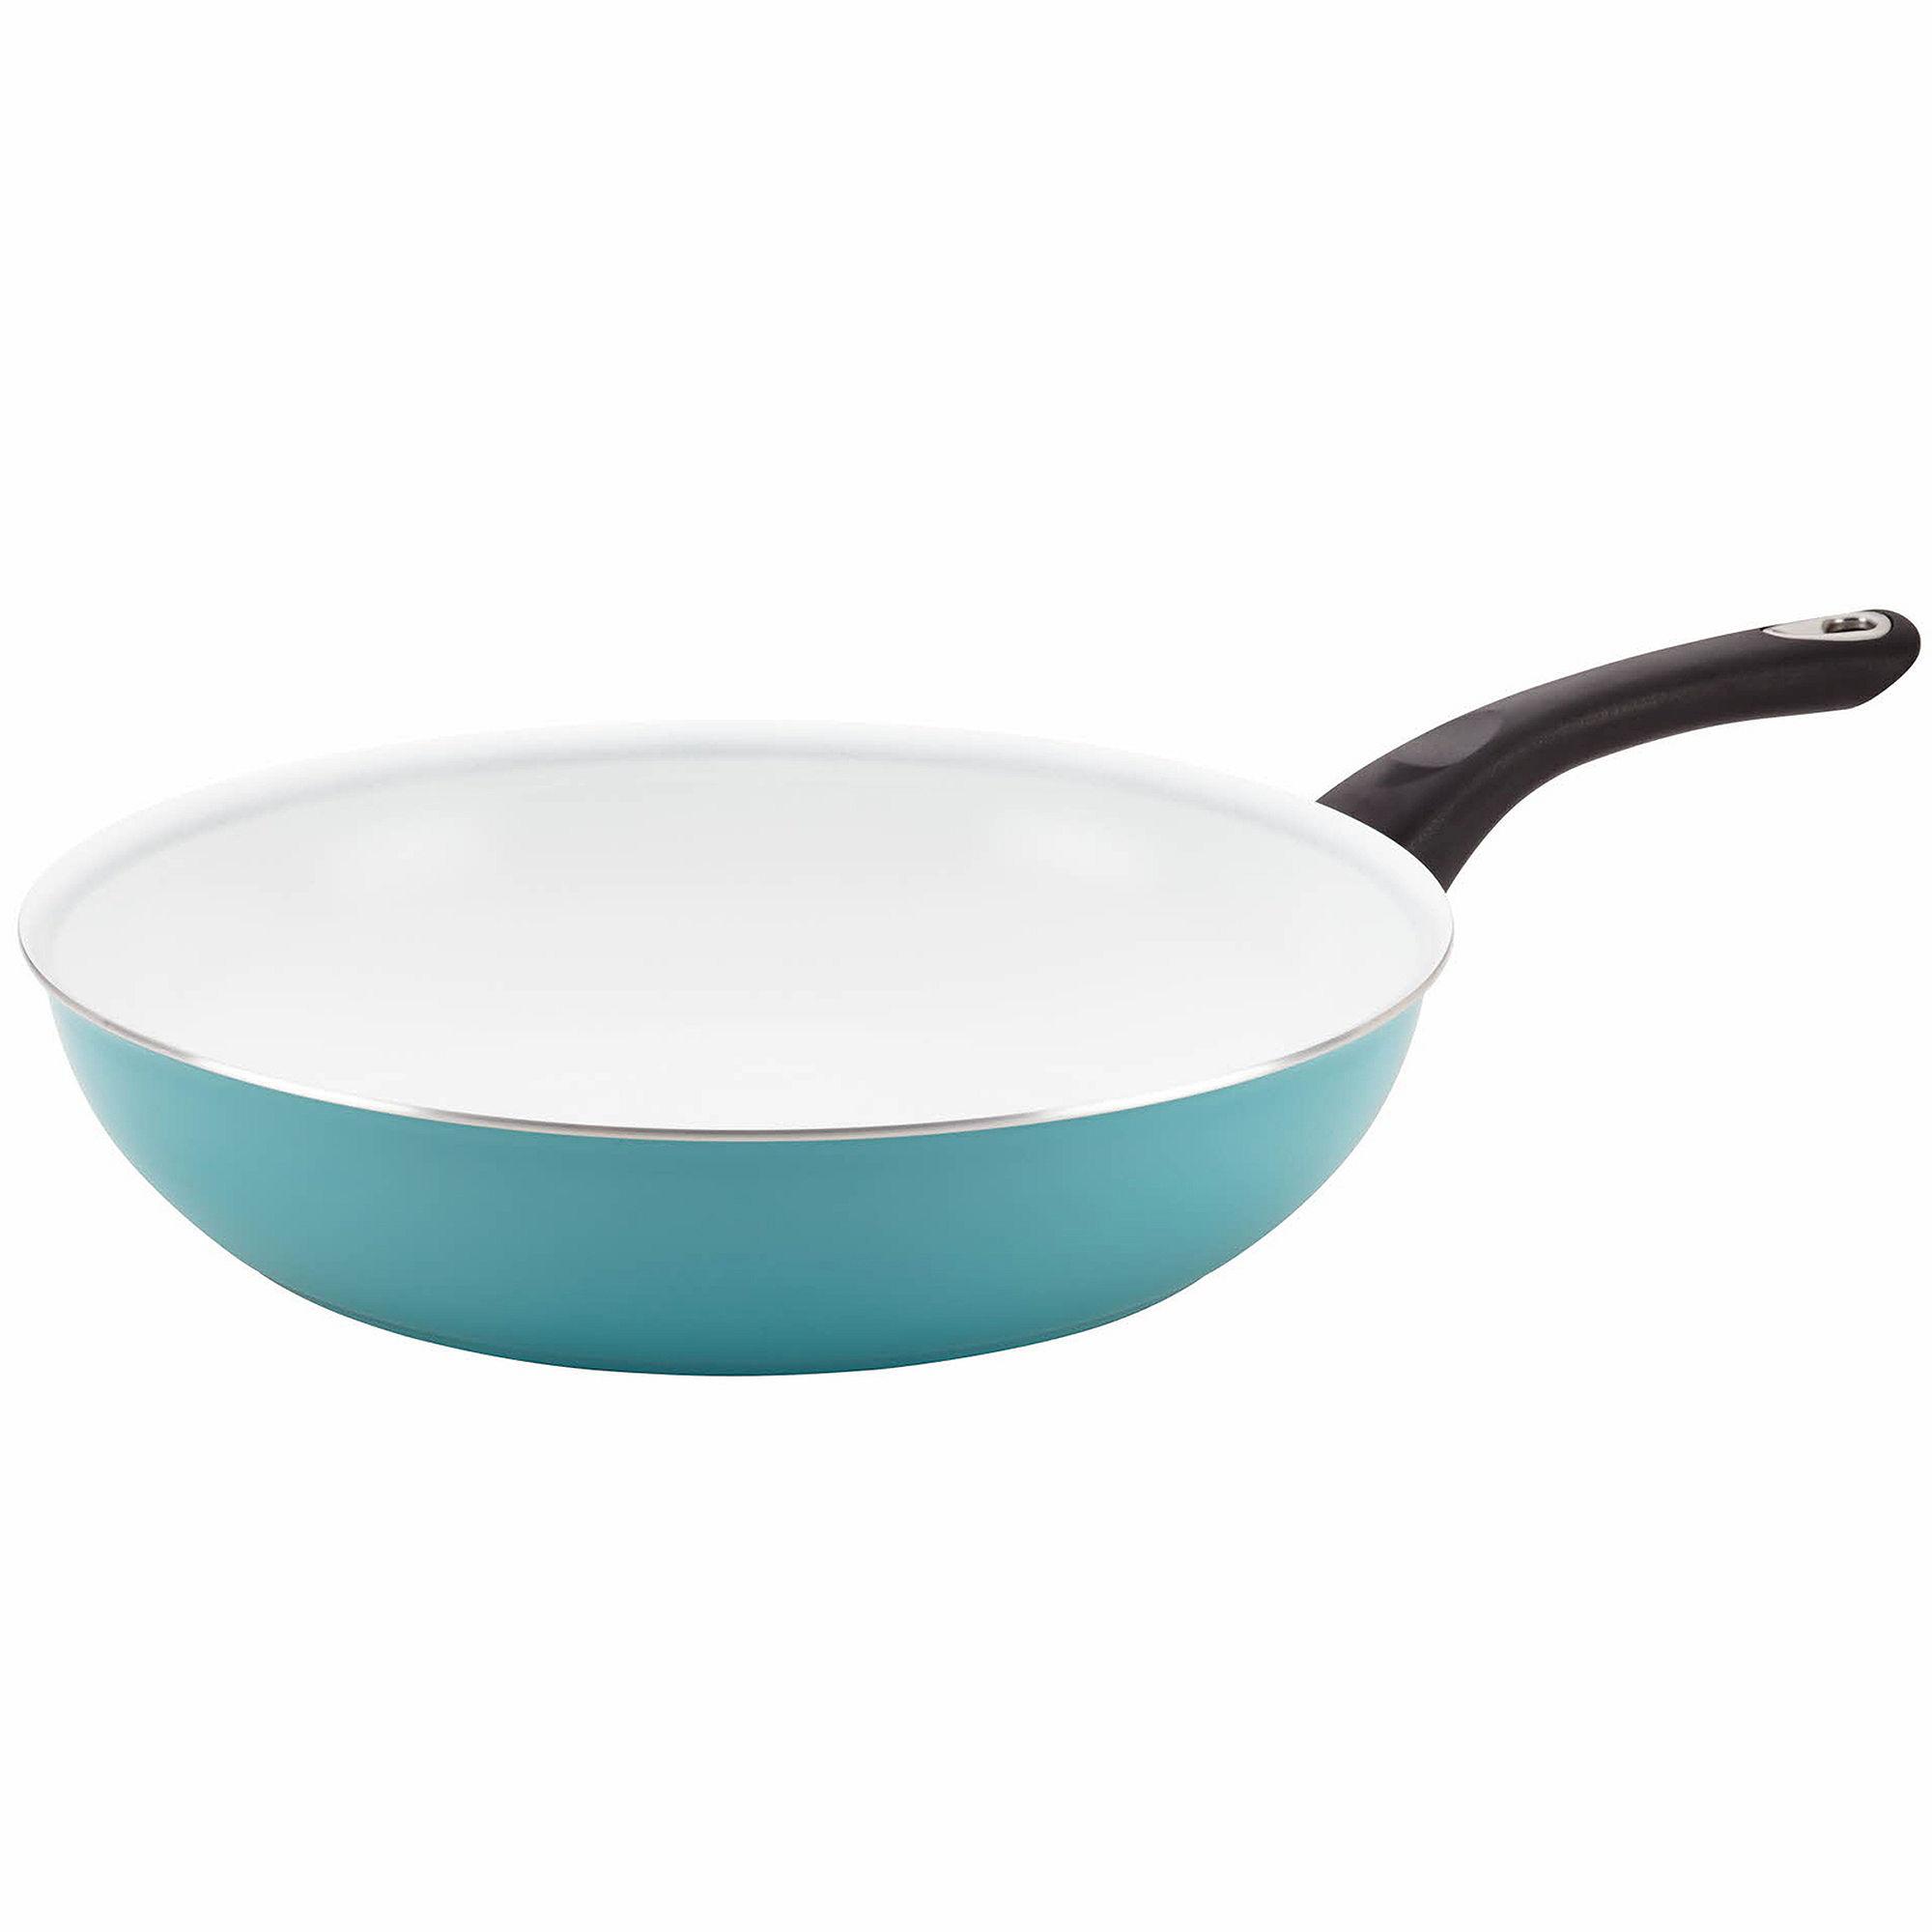 "Farberware purECOok 12"" Ceramic Nonstick Deep Skillet"